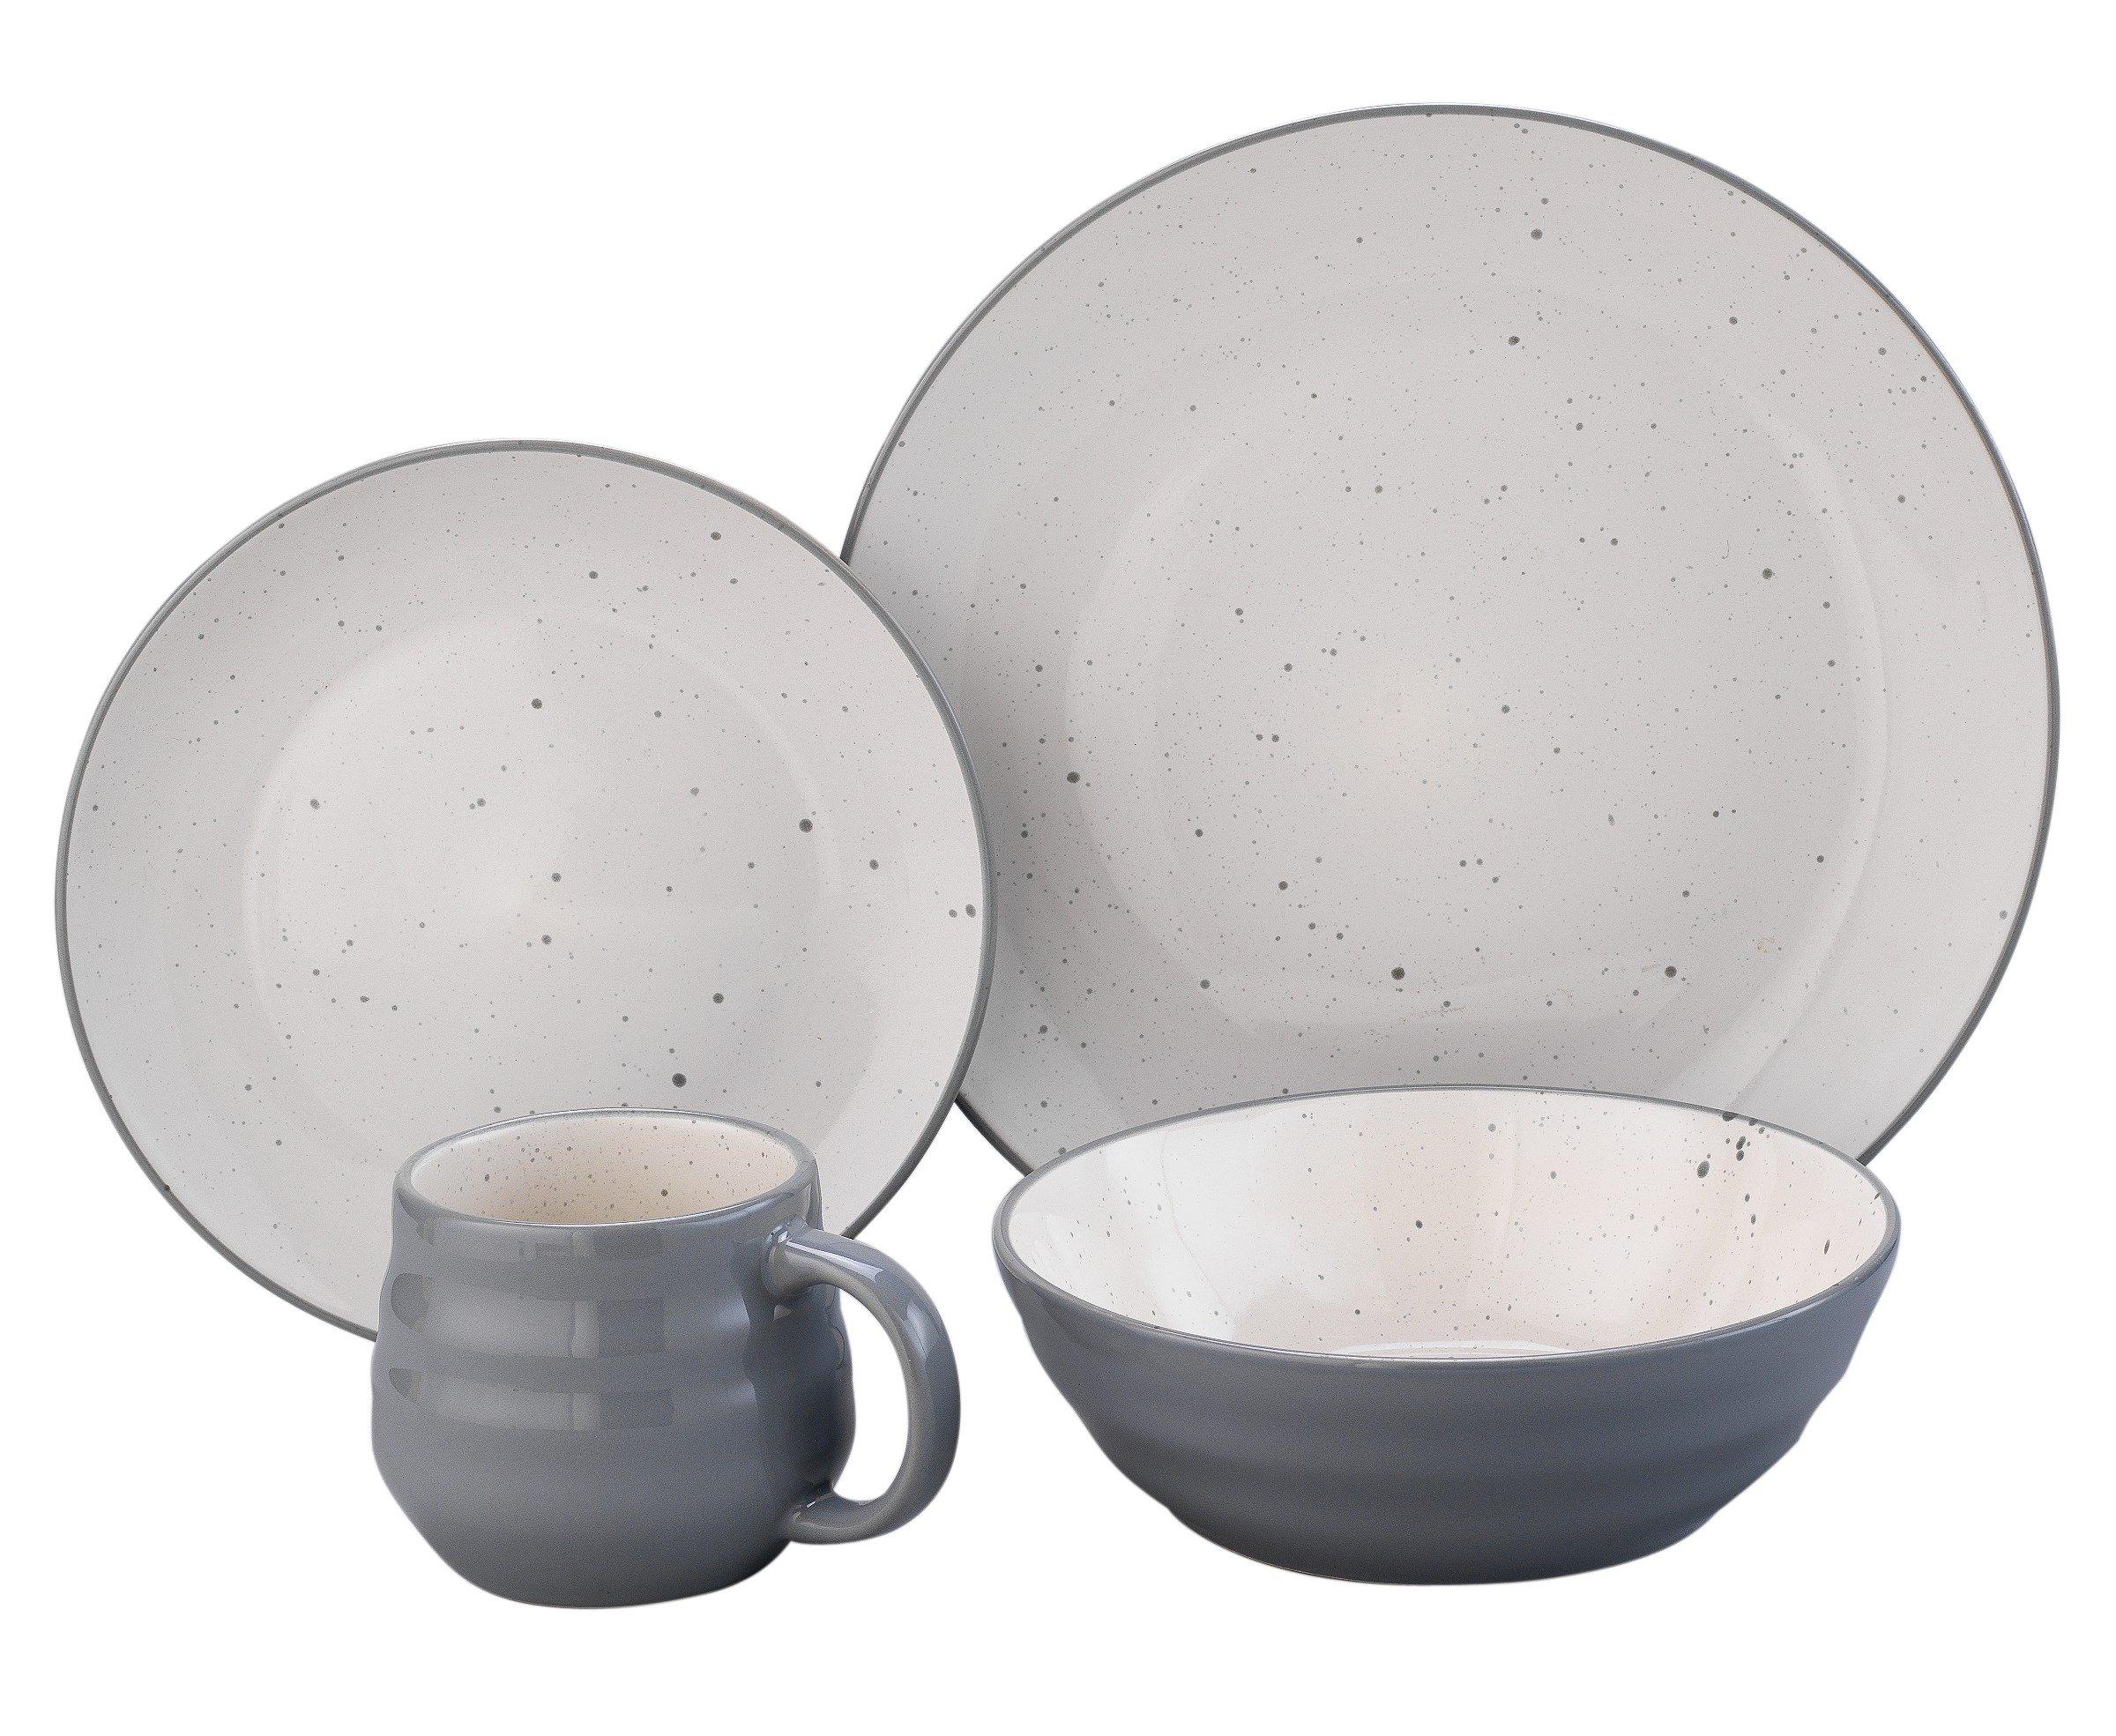 SALE on Heart Of House Artisan 16 Piece Stoneware Dinner ...